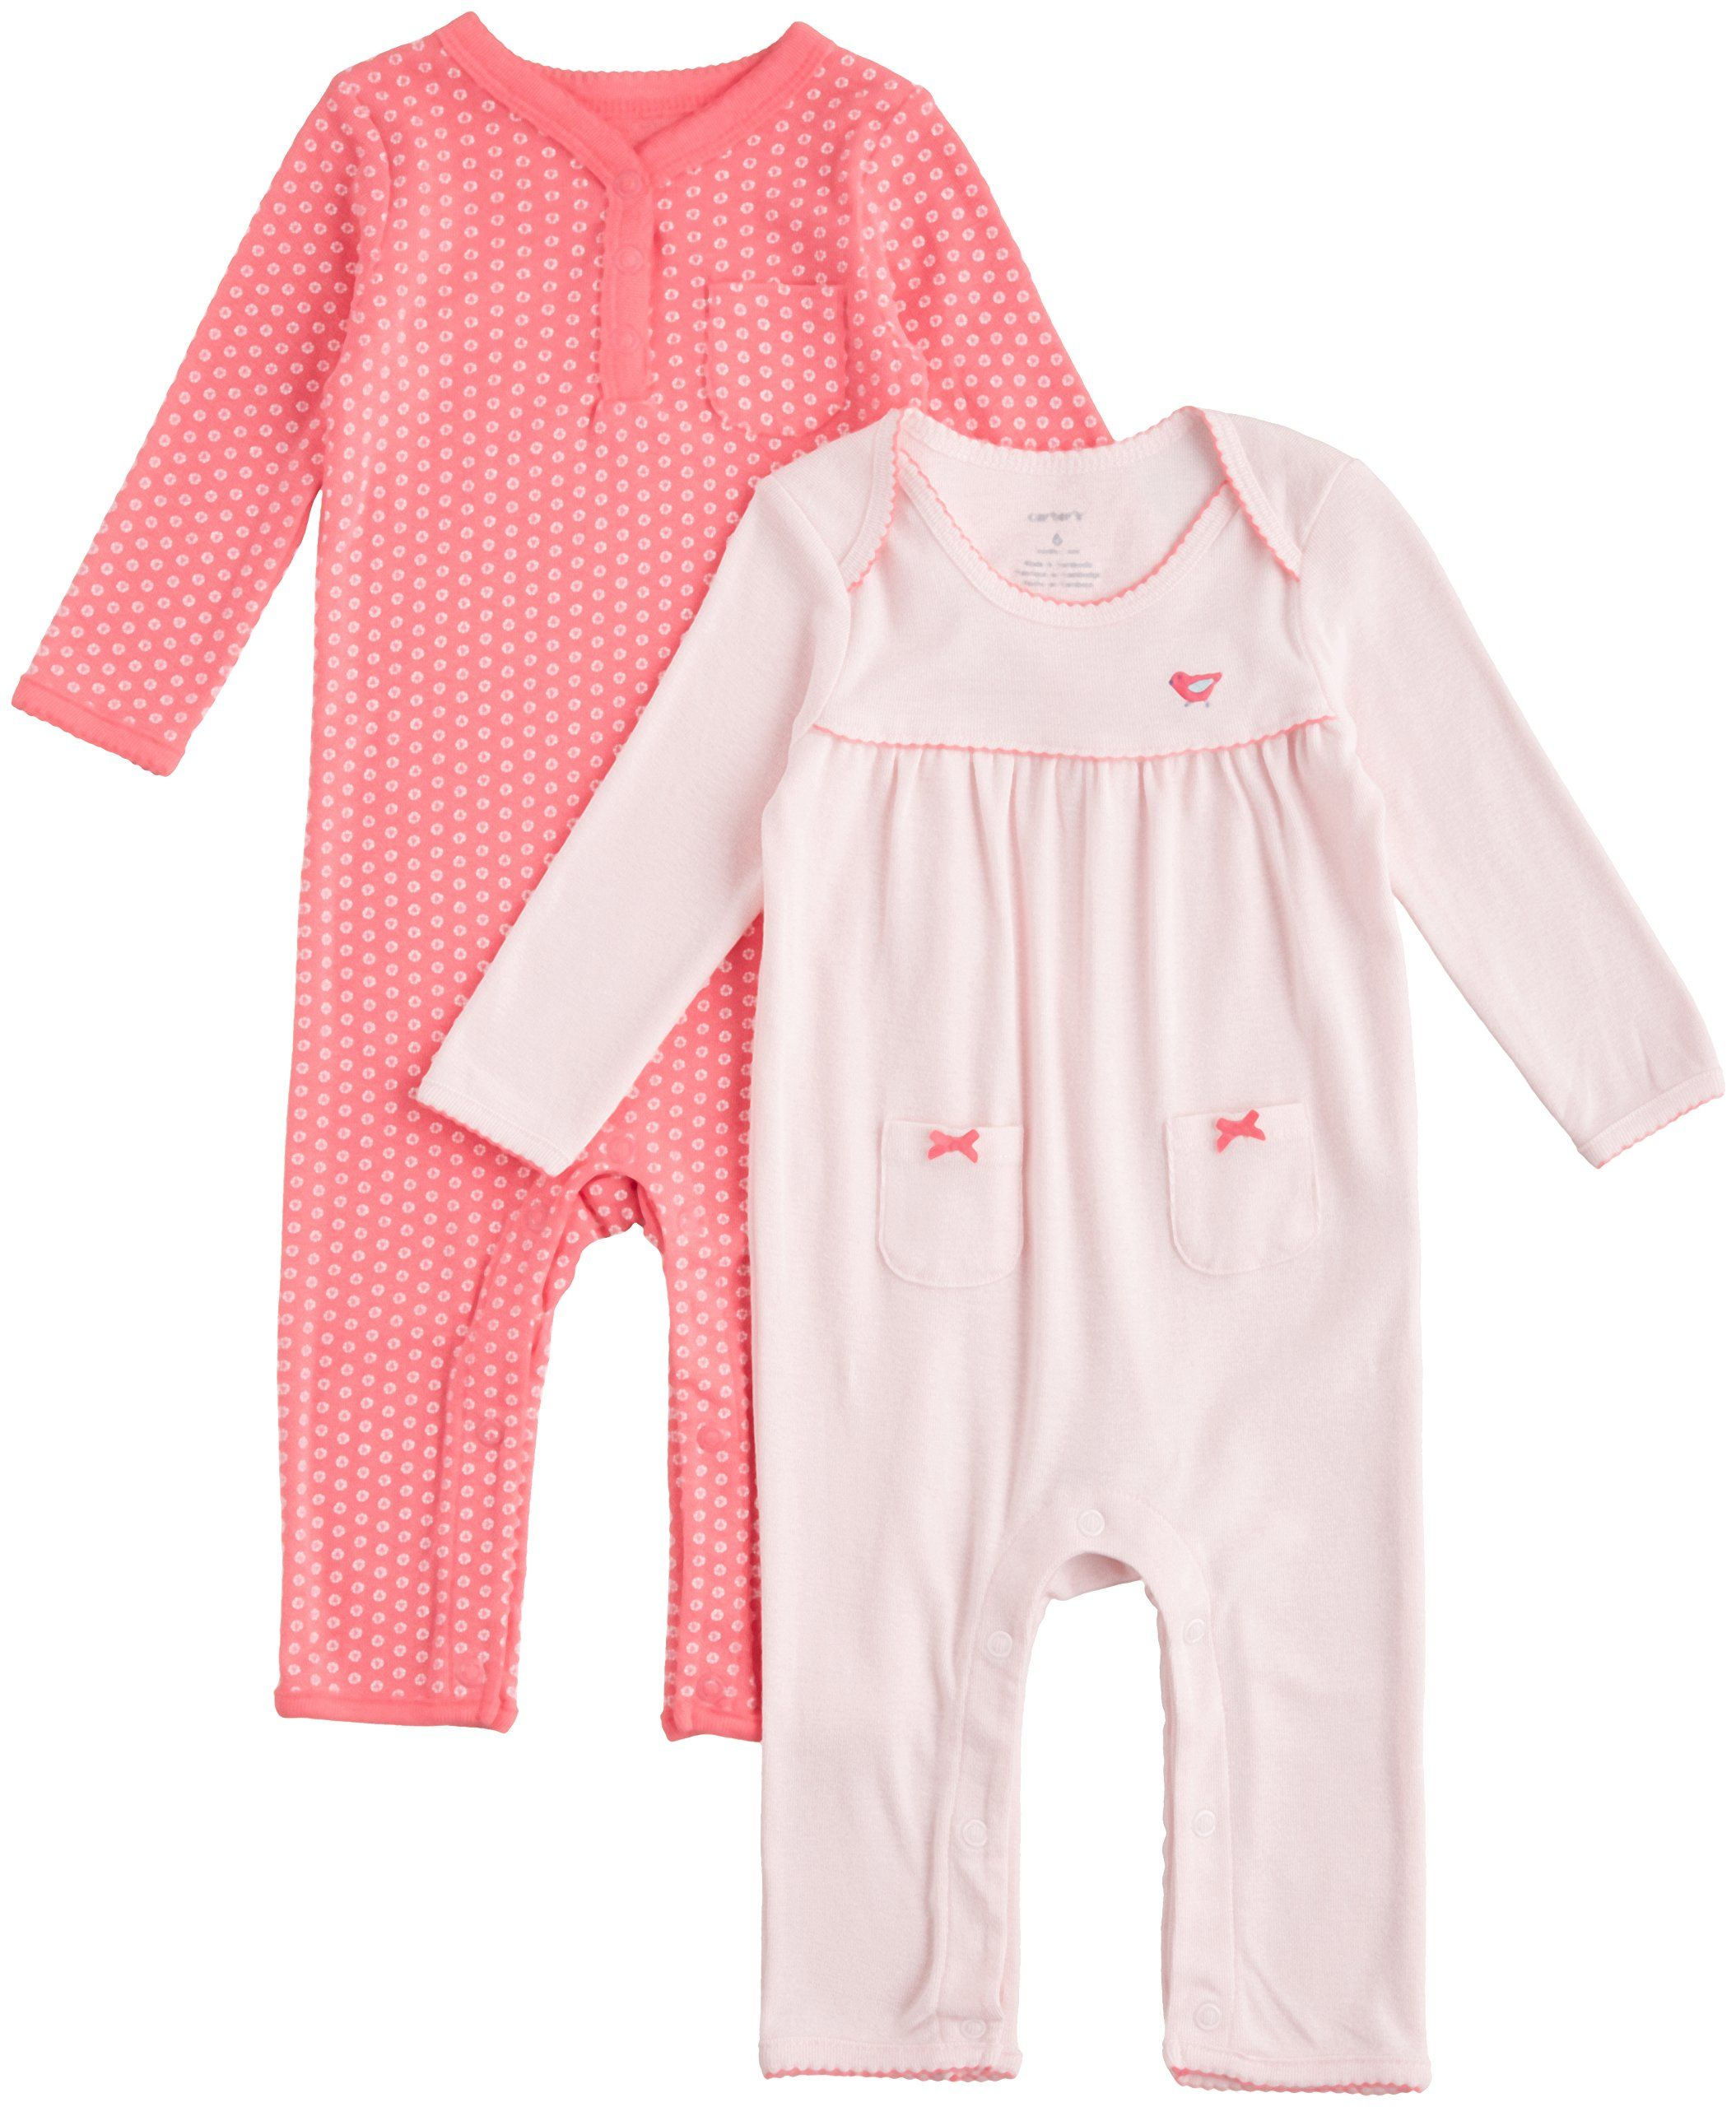 Carter s Baby Girls 2 Pack Coverall Set Baby Pink Newborn